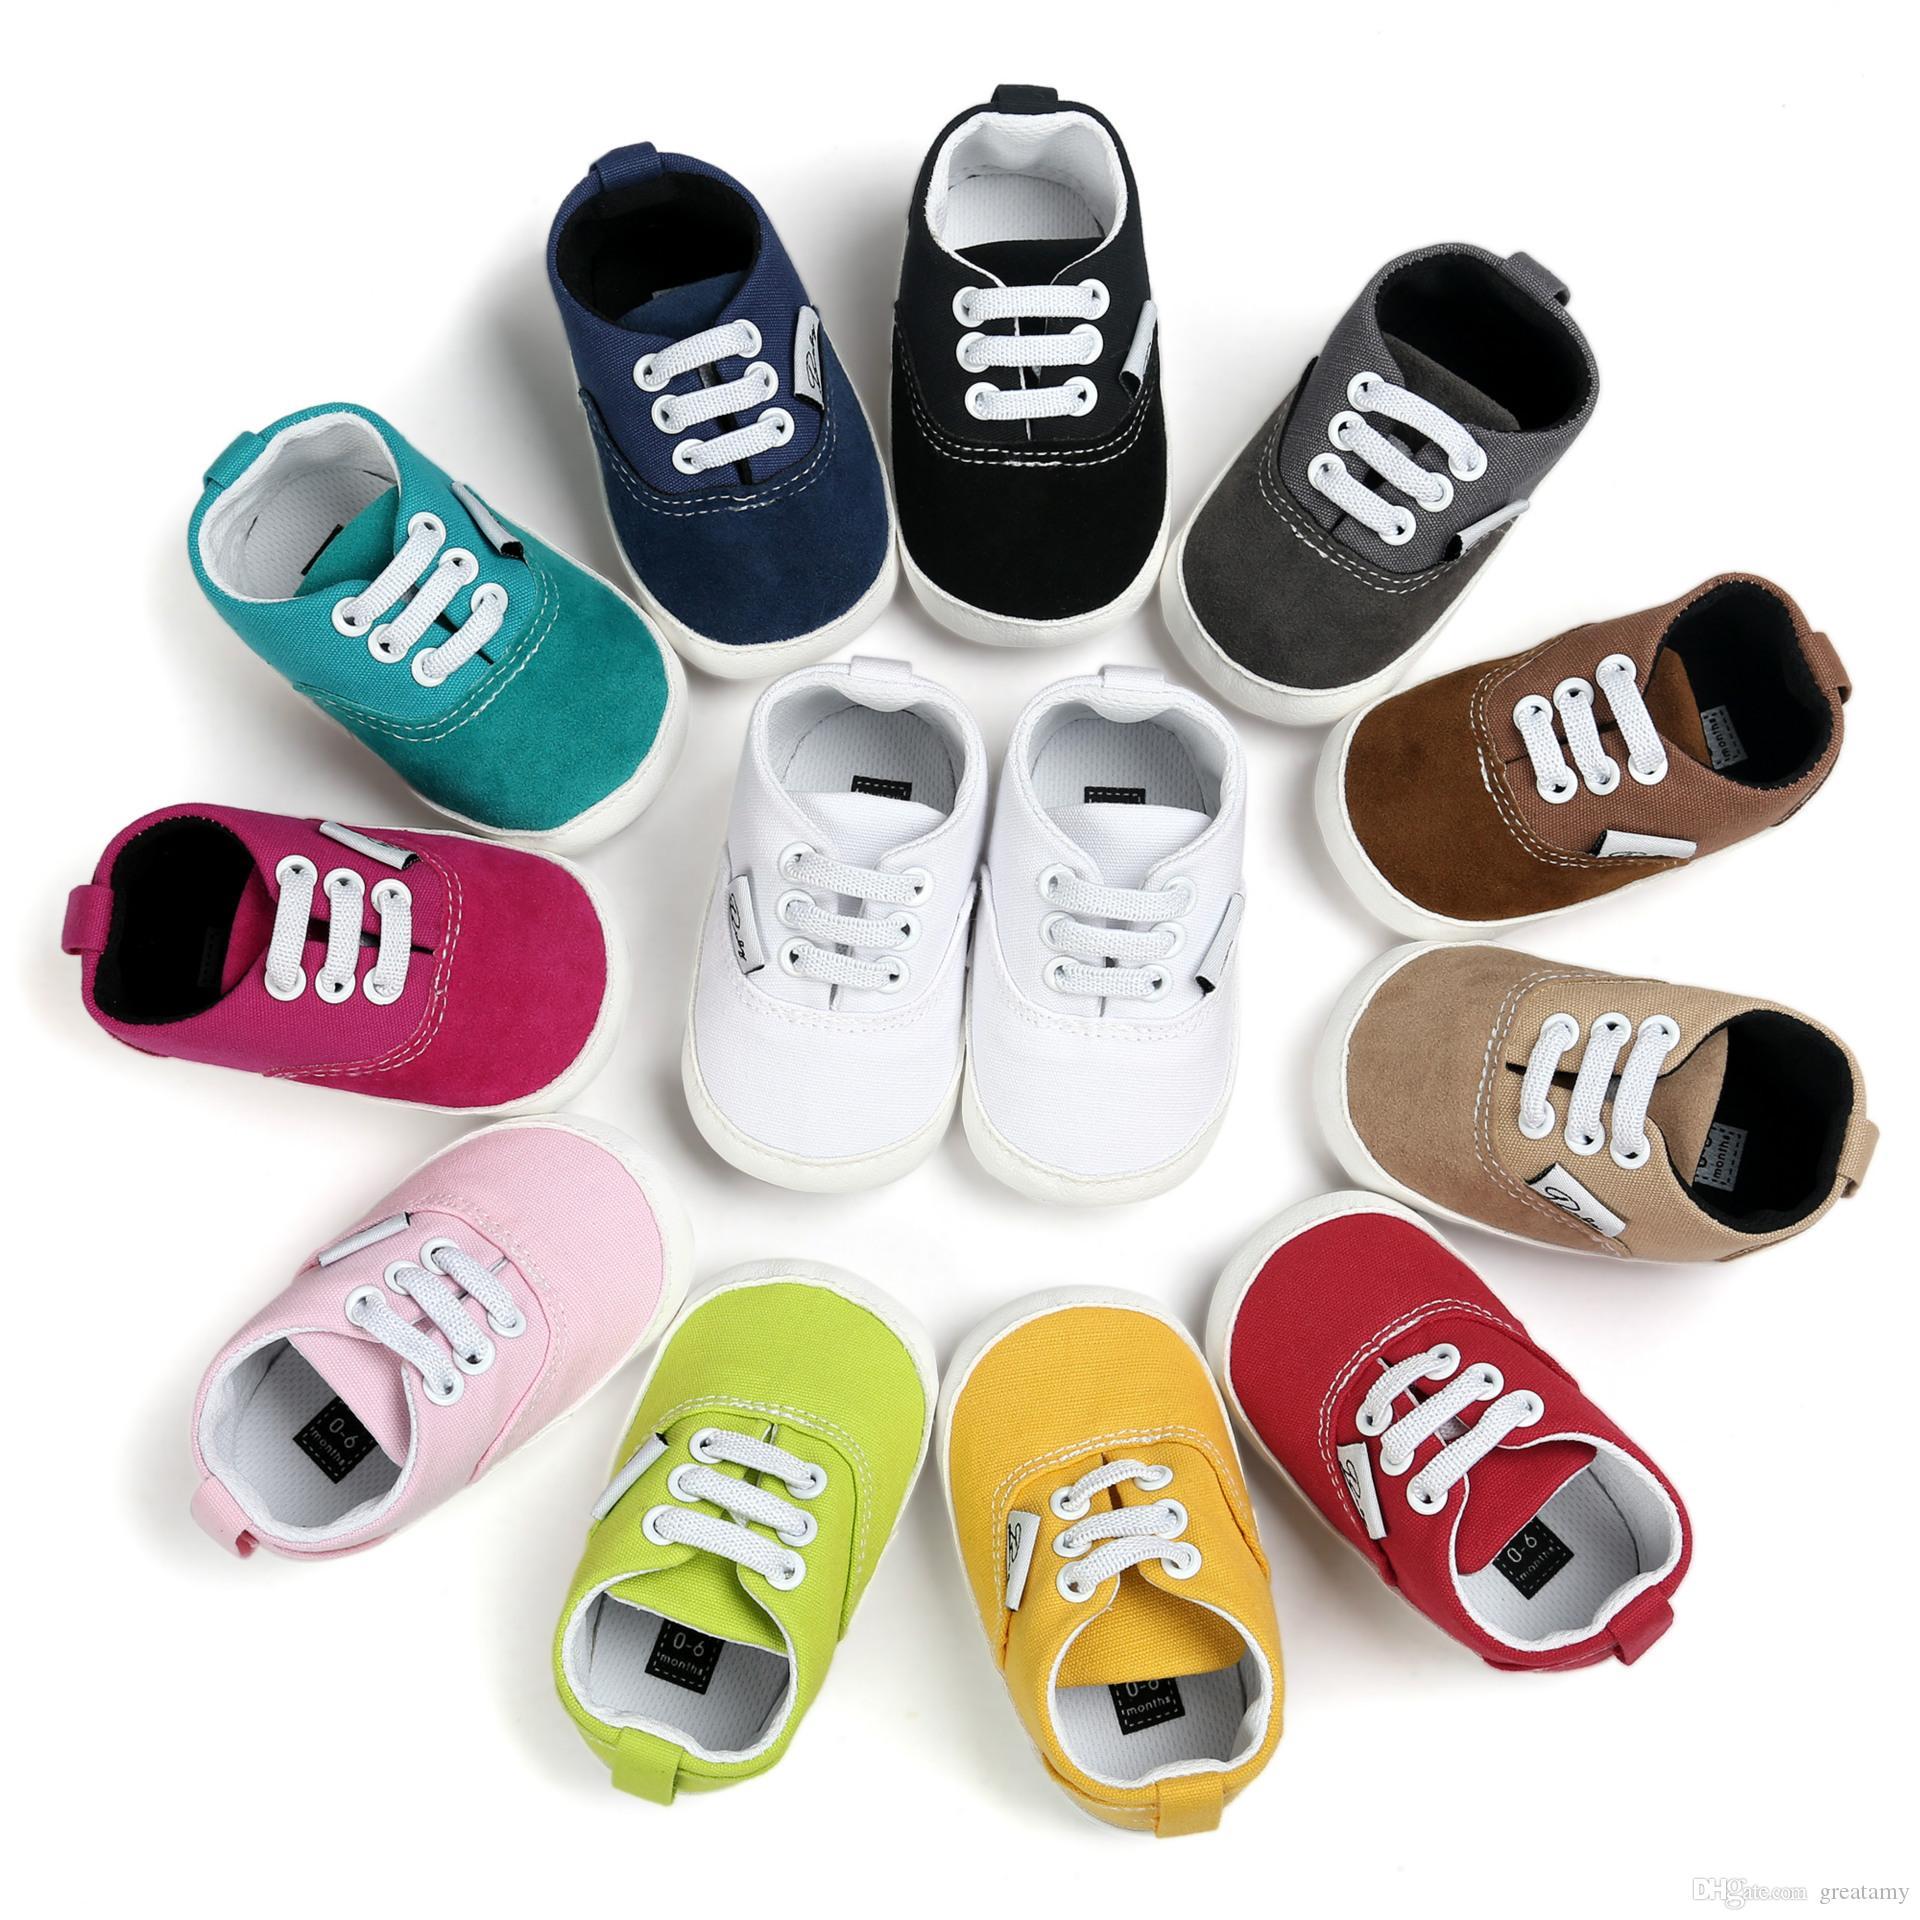 Mother & Kids Boys Girls First Walkers Newborn Baby Prewalker Soft Sole Toddler Sports Shoes Anti-slip Kids Canvas Shoes Children Feet Wear Convenient To Cook